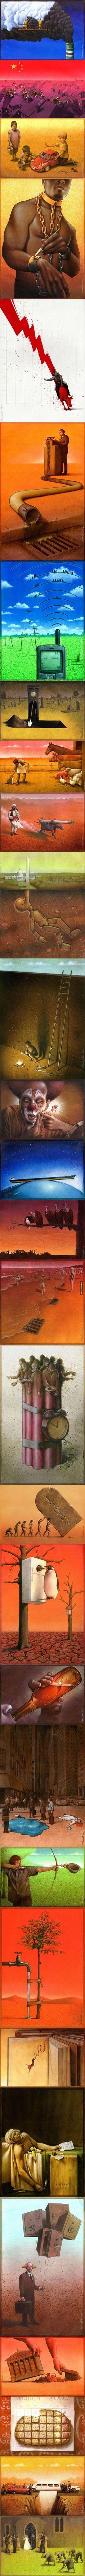 30 Satirical images created by Pawel Kuczynski - 9GAG on imgfave  I like this